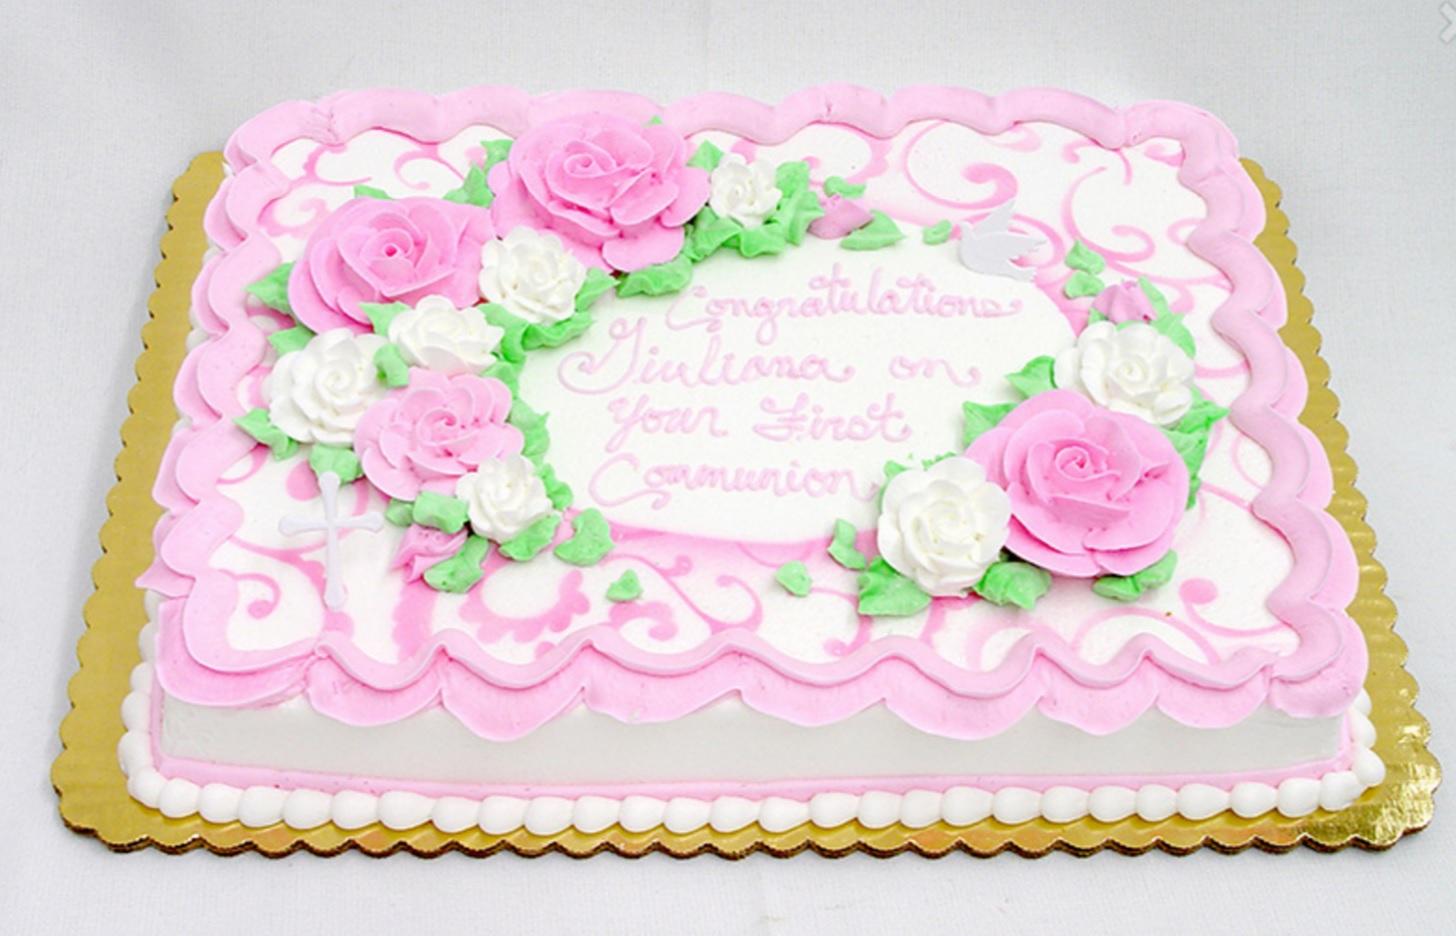 Acme Bakery Birthday Cakes